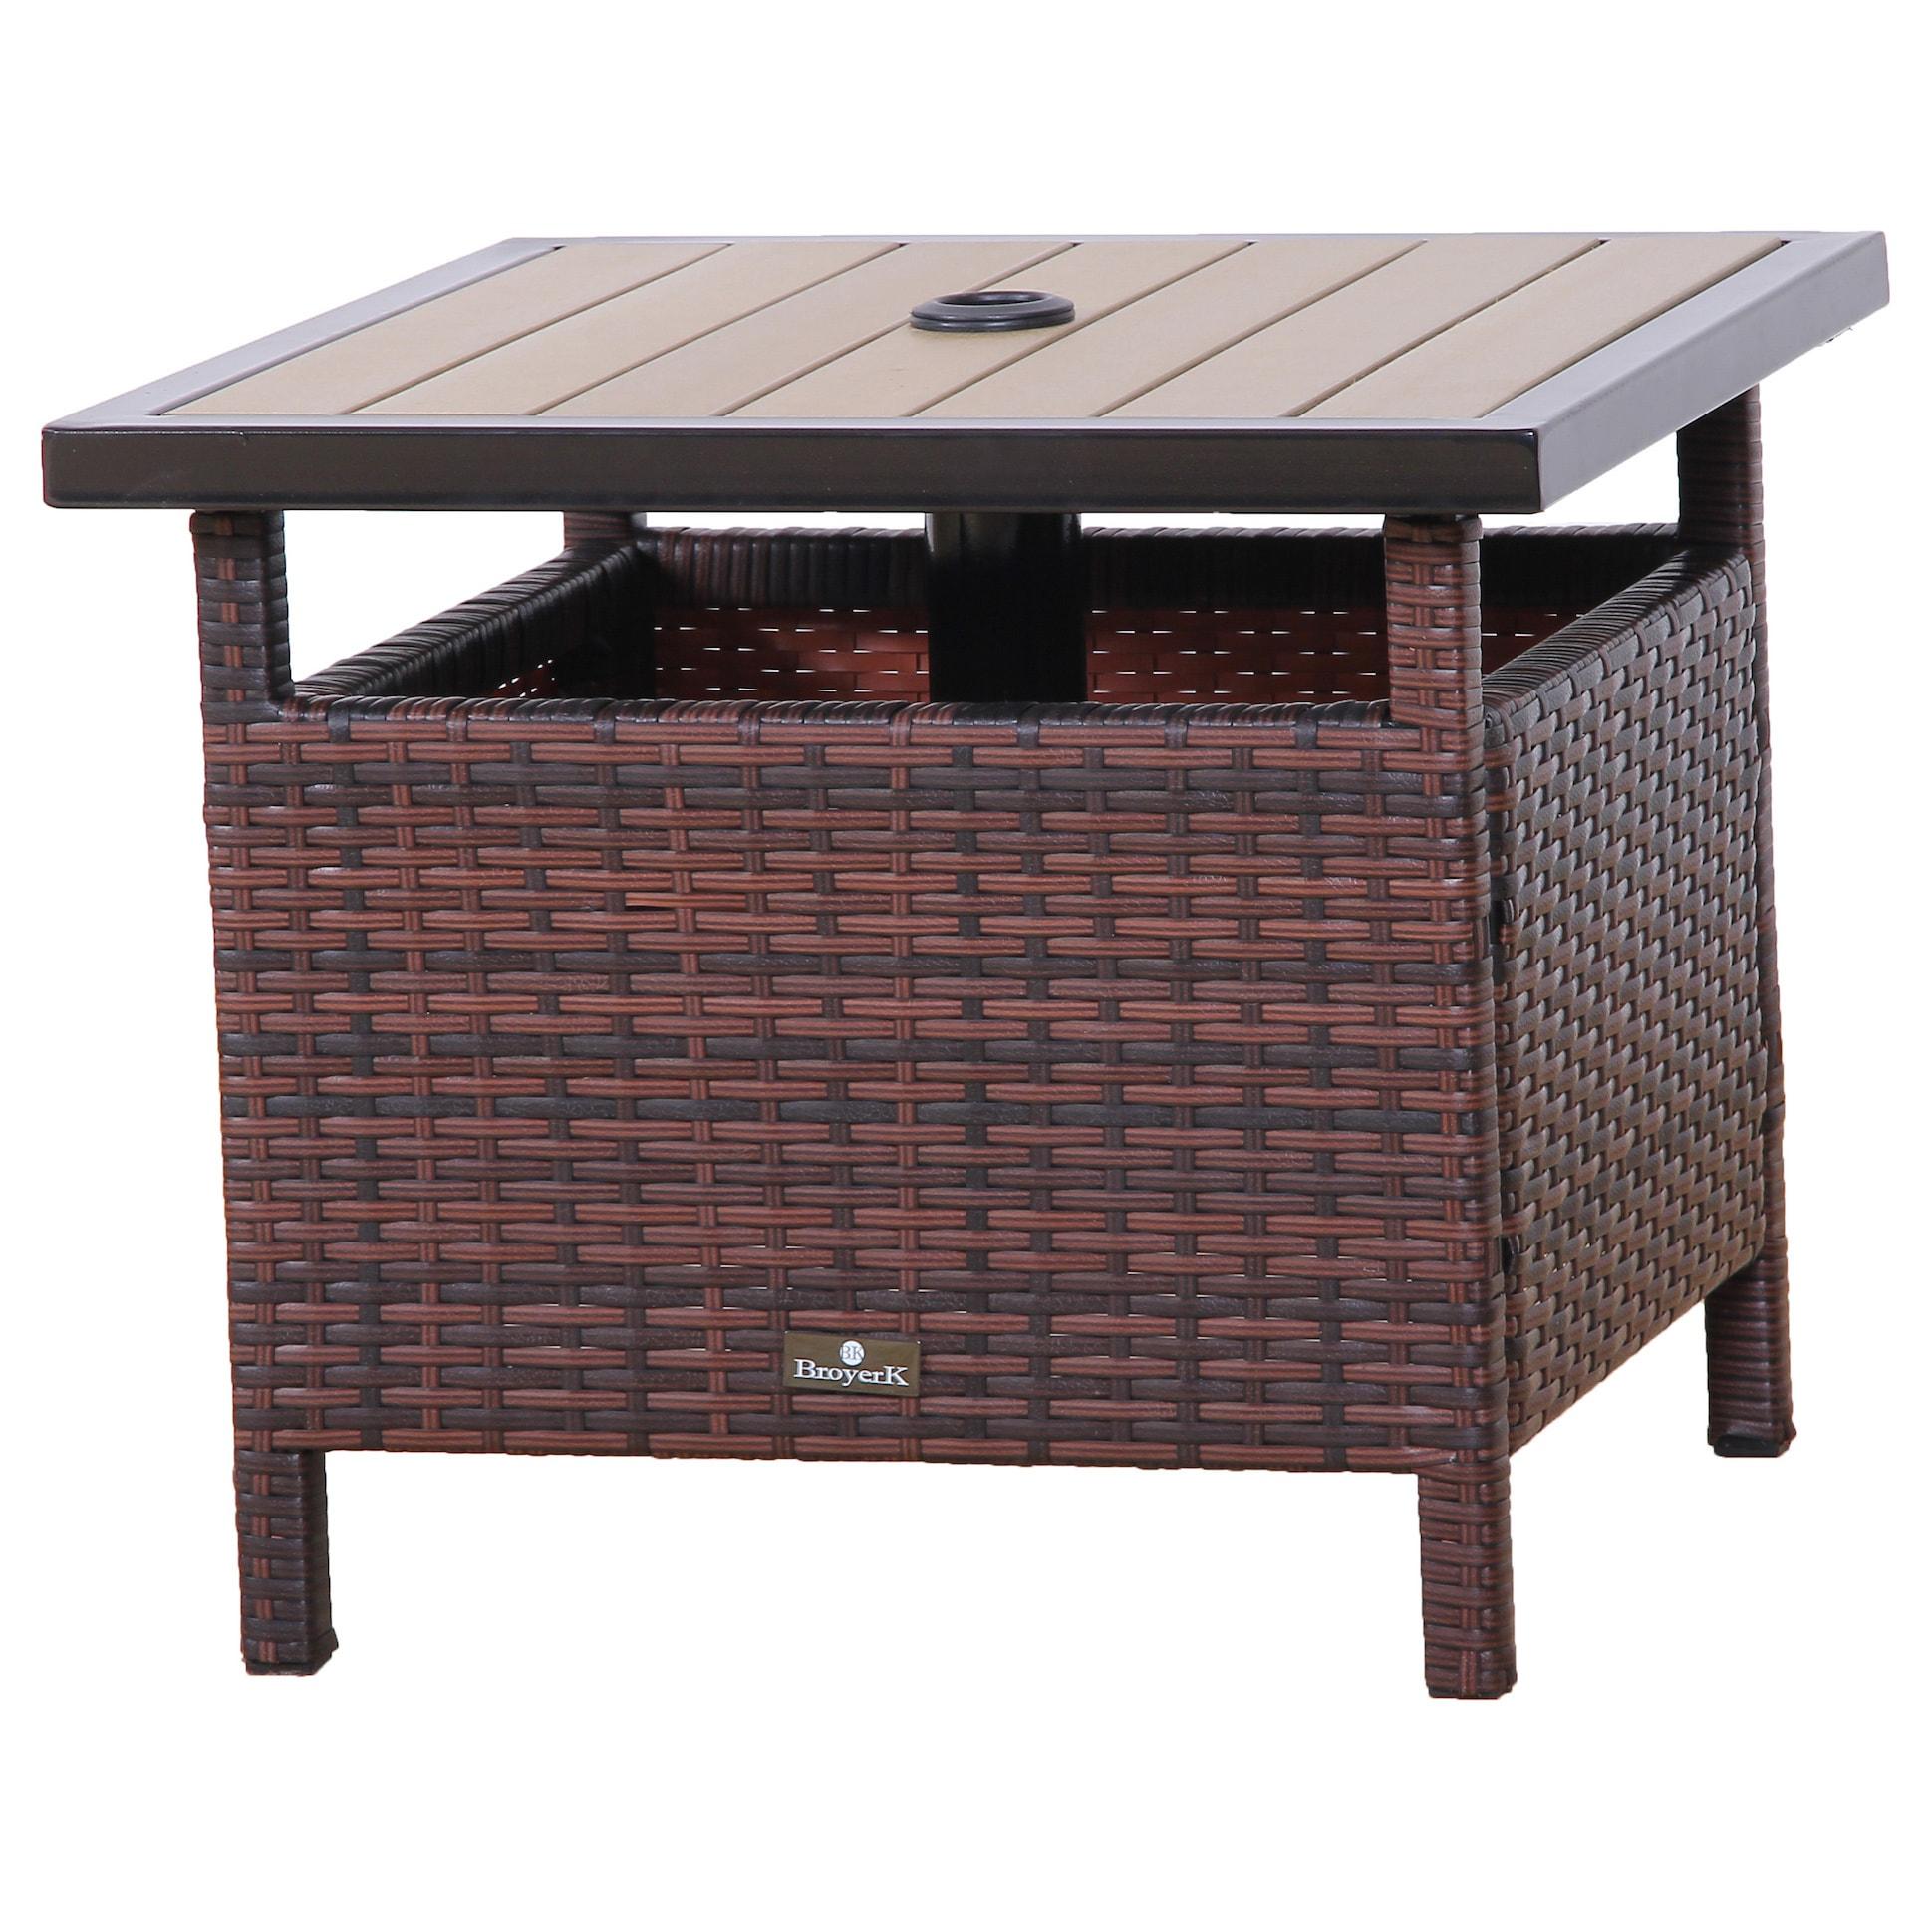 Shop Broyerk Rattan Wood Patio Umbrella Stand Dining Table Free